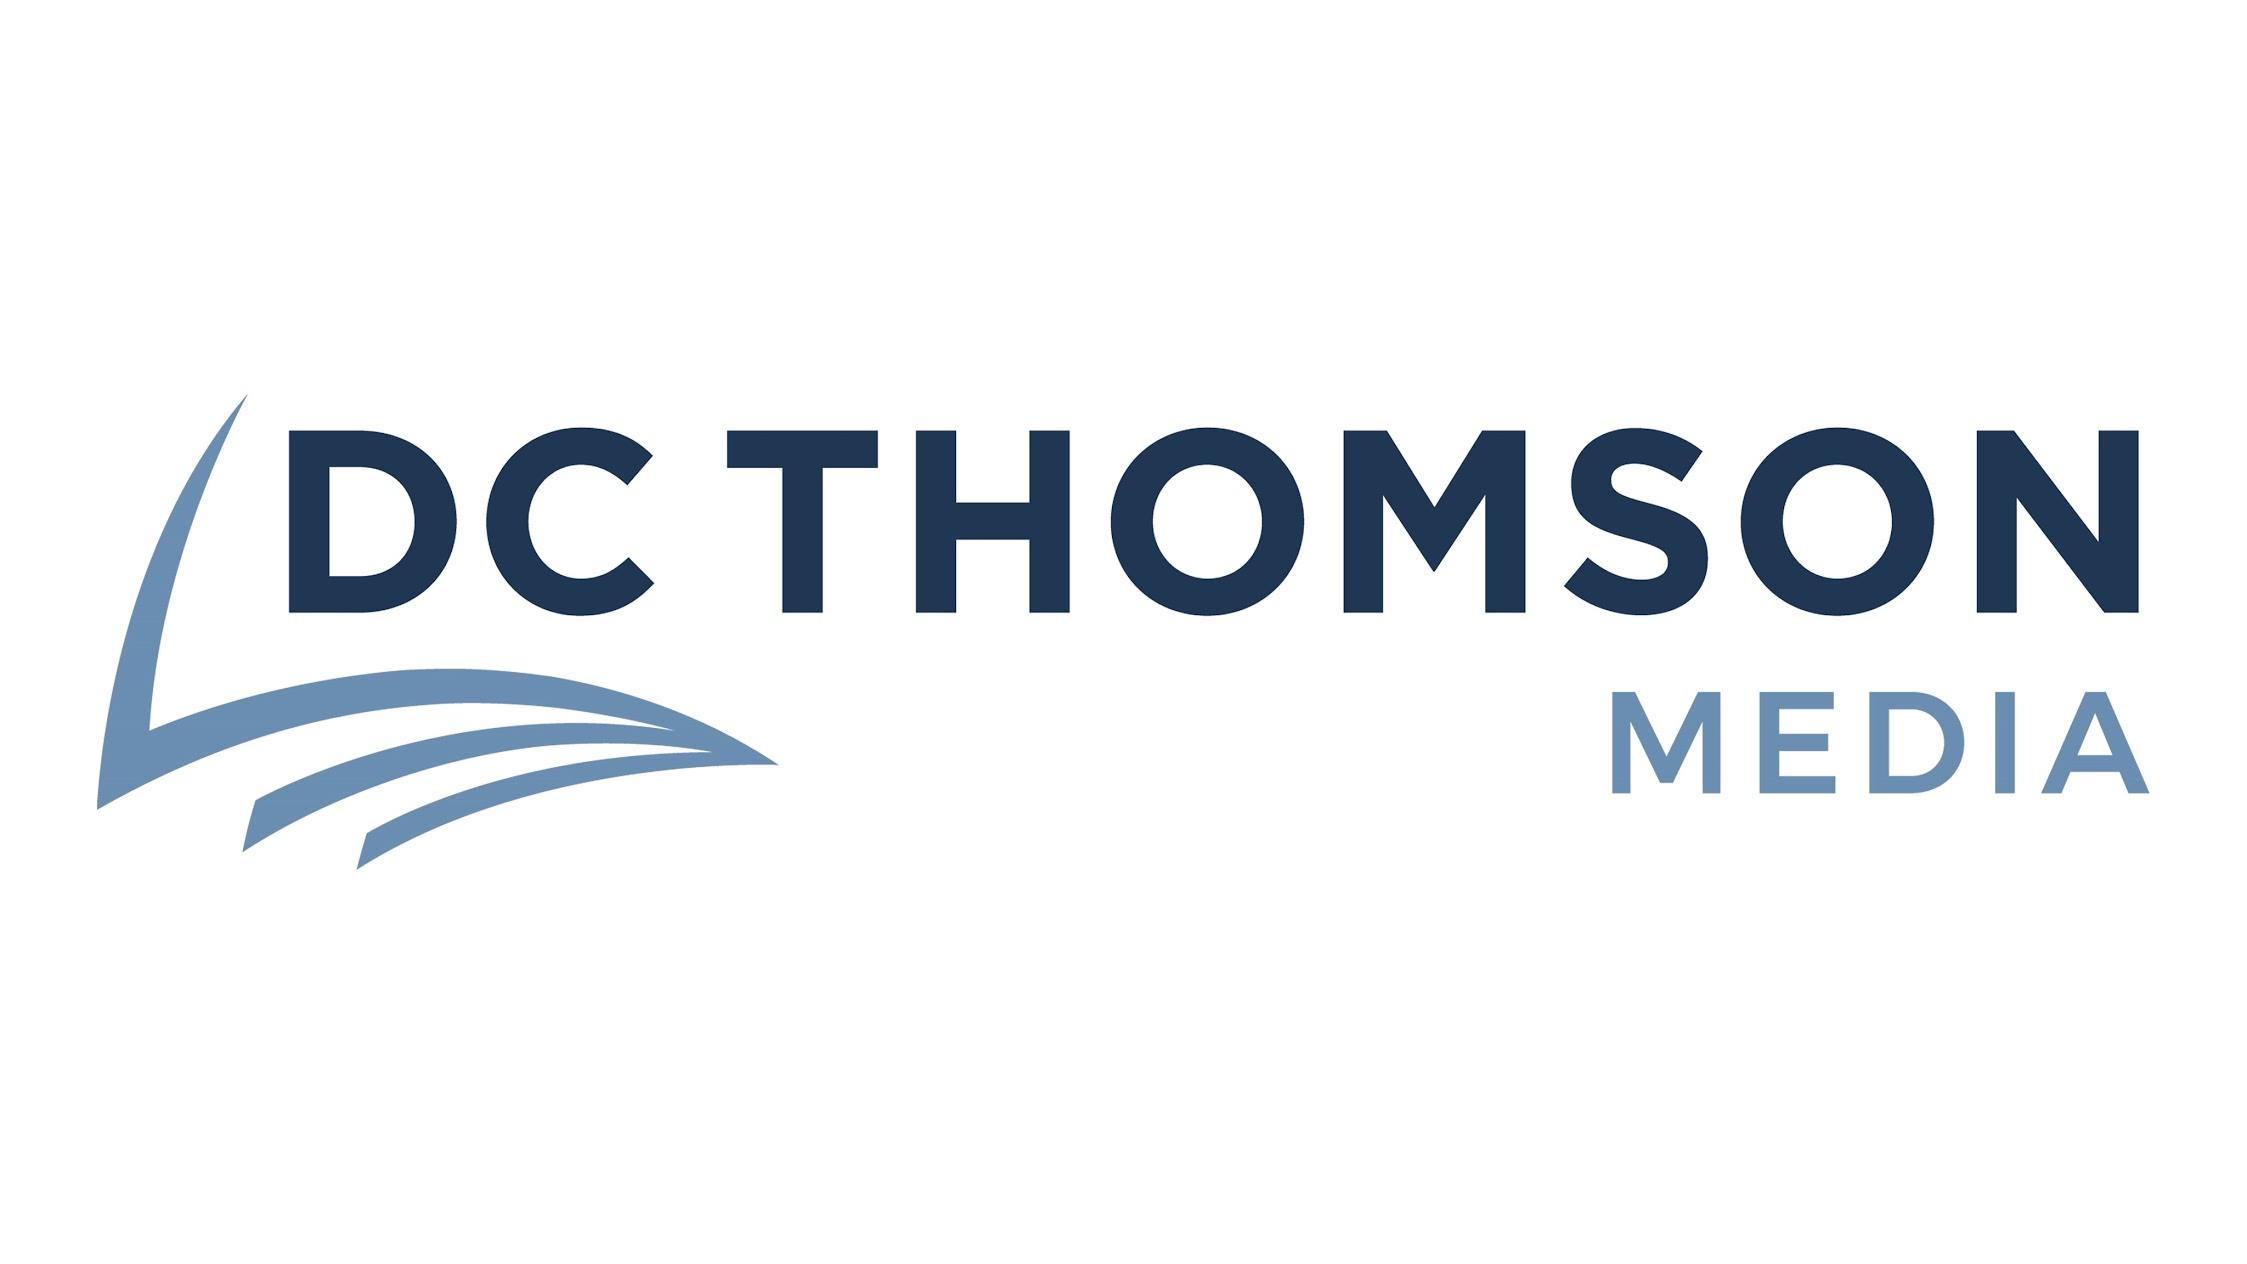 DC Thomson Media